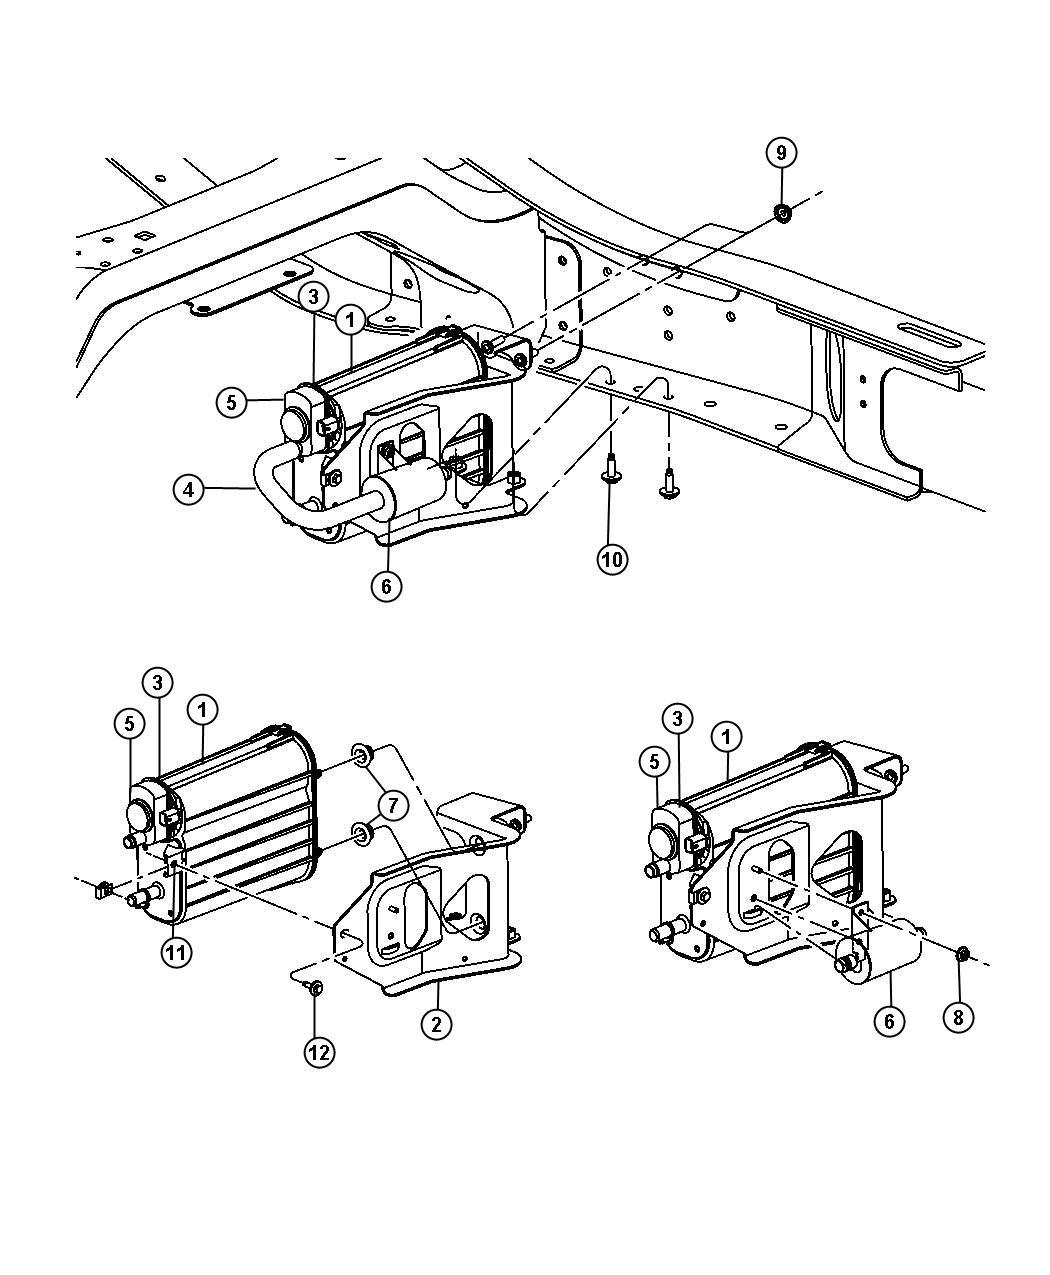 7 3 Fuel Pump Leak